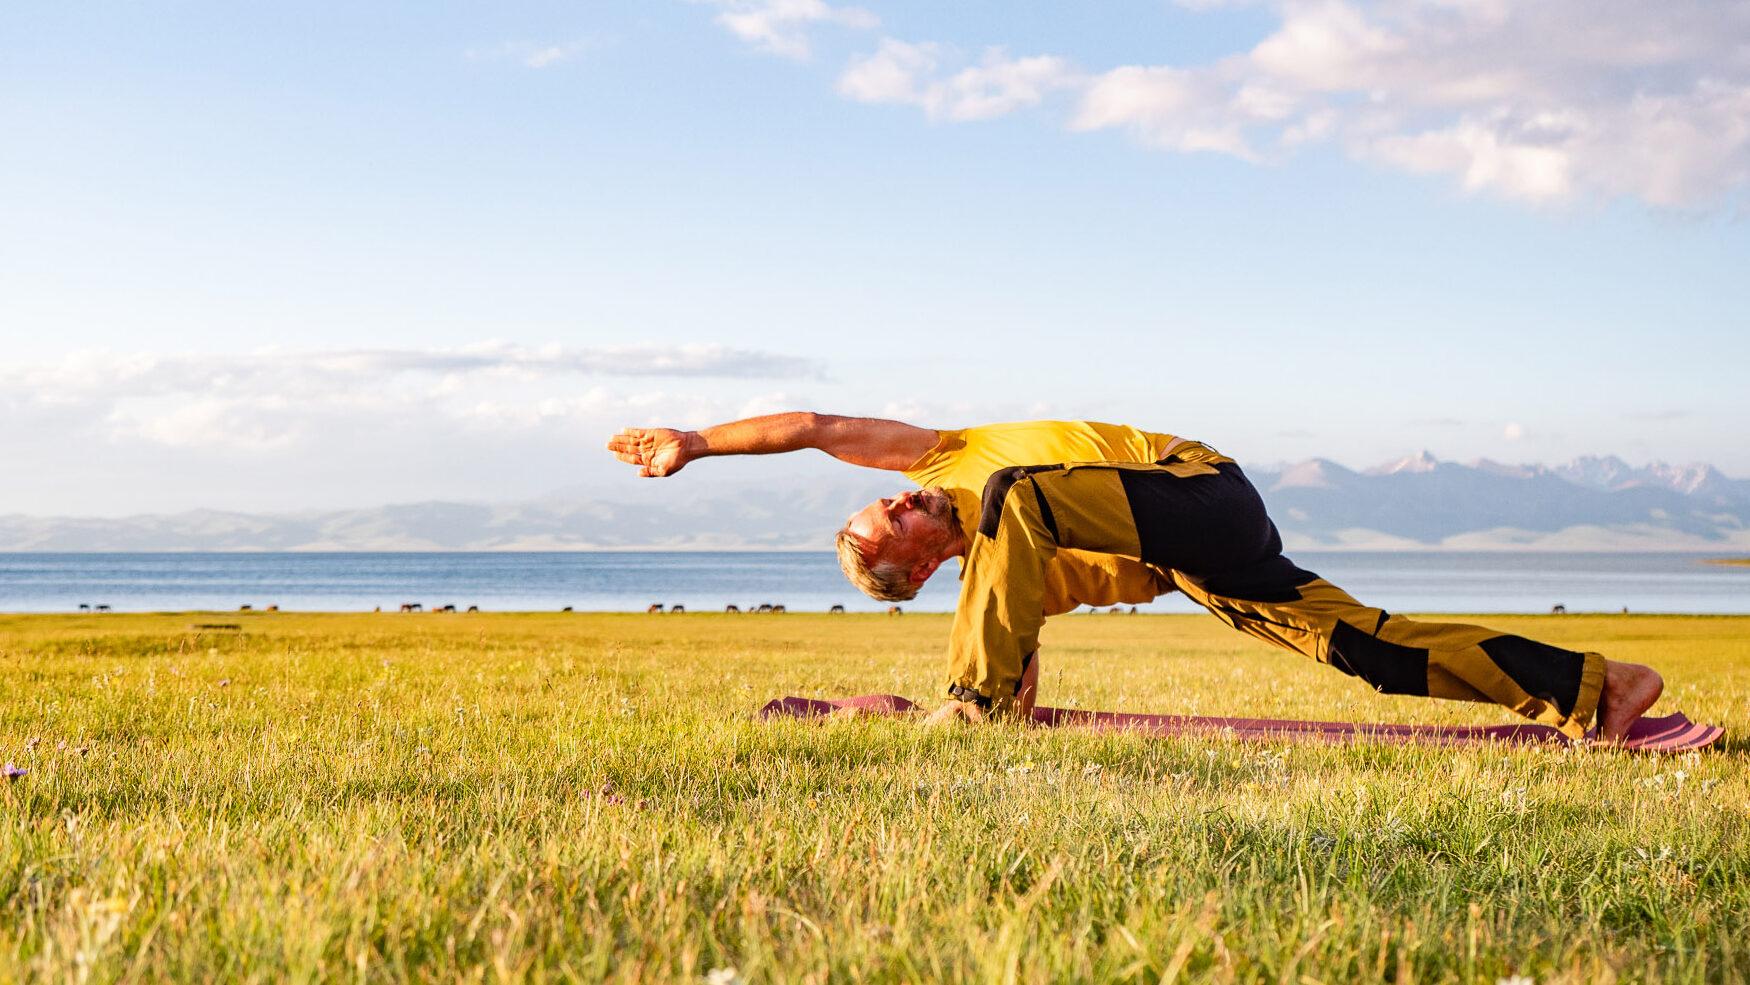 golden yoga dresden ramadhuta parivritta utthan pristhasana online yoga im yogastudio